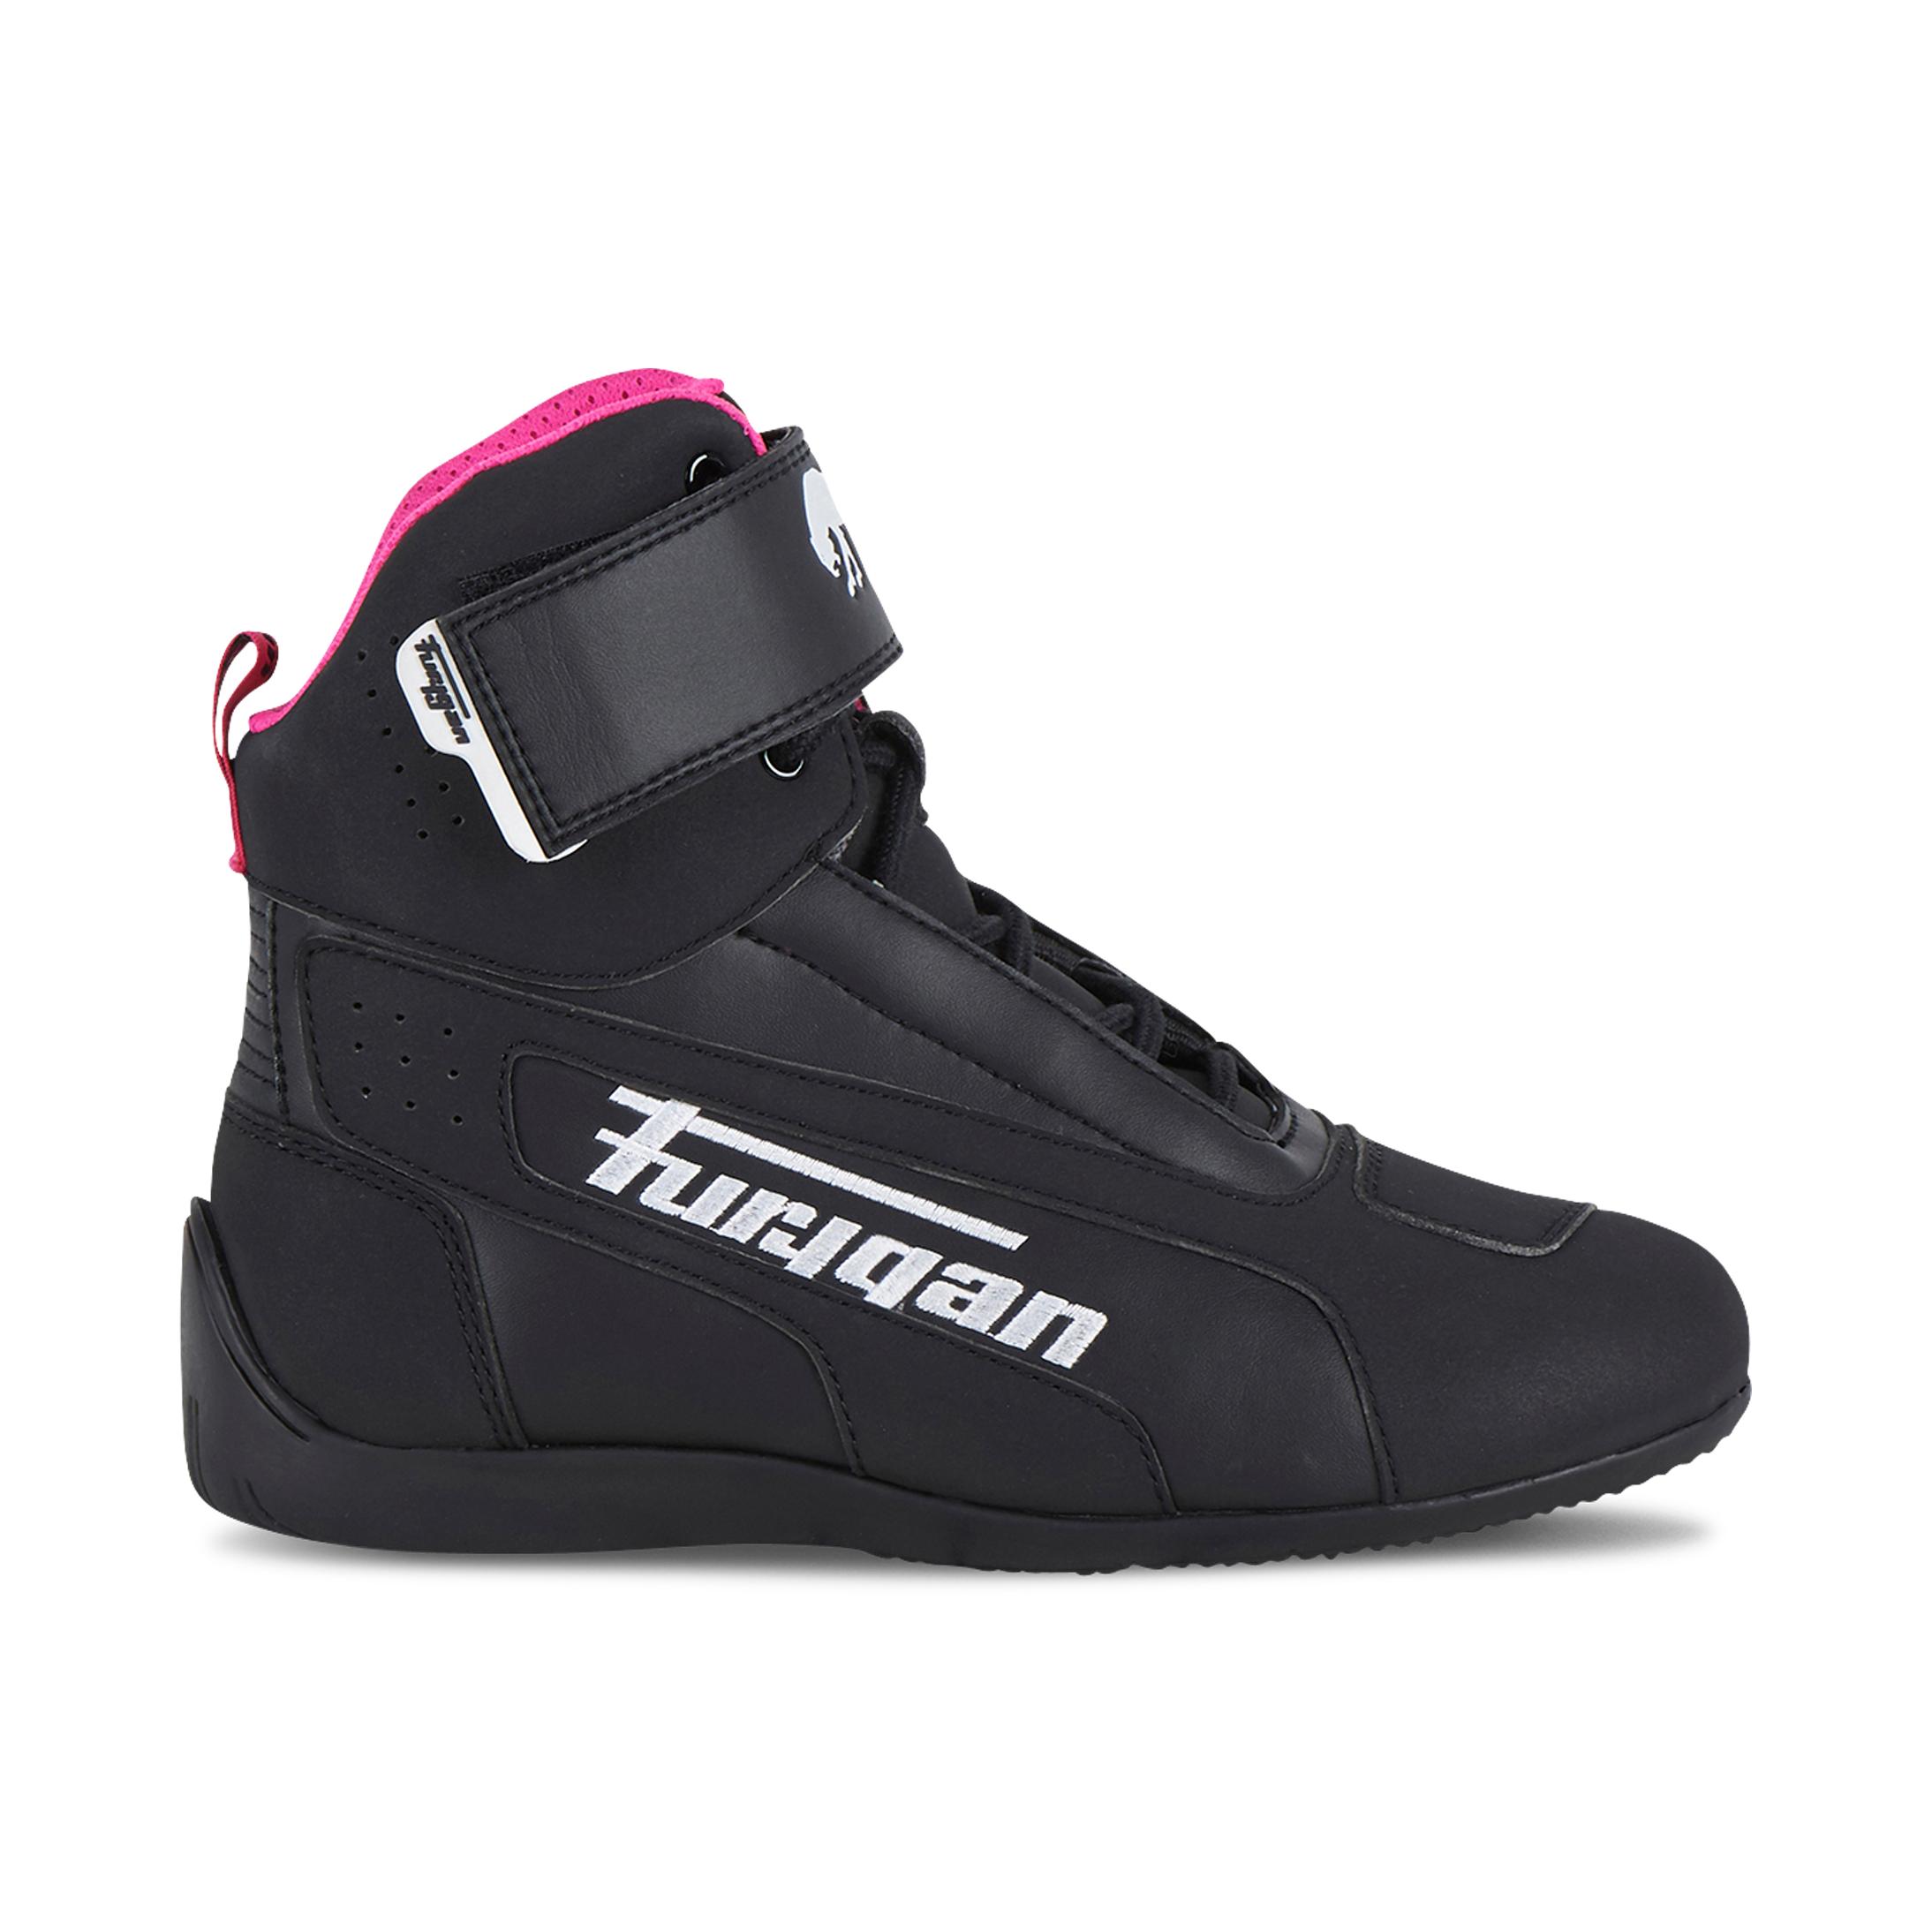 Furygan Scarpe Moto Donna  Zephyr D3O Nero-Bianco-Rosa